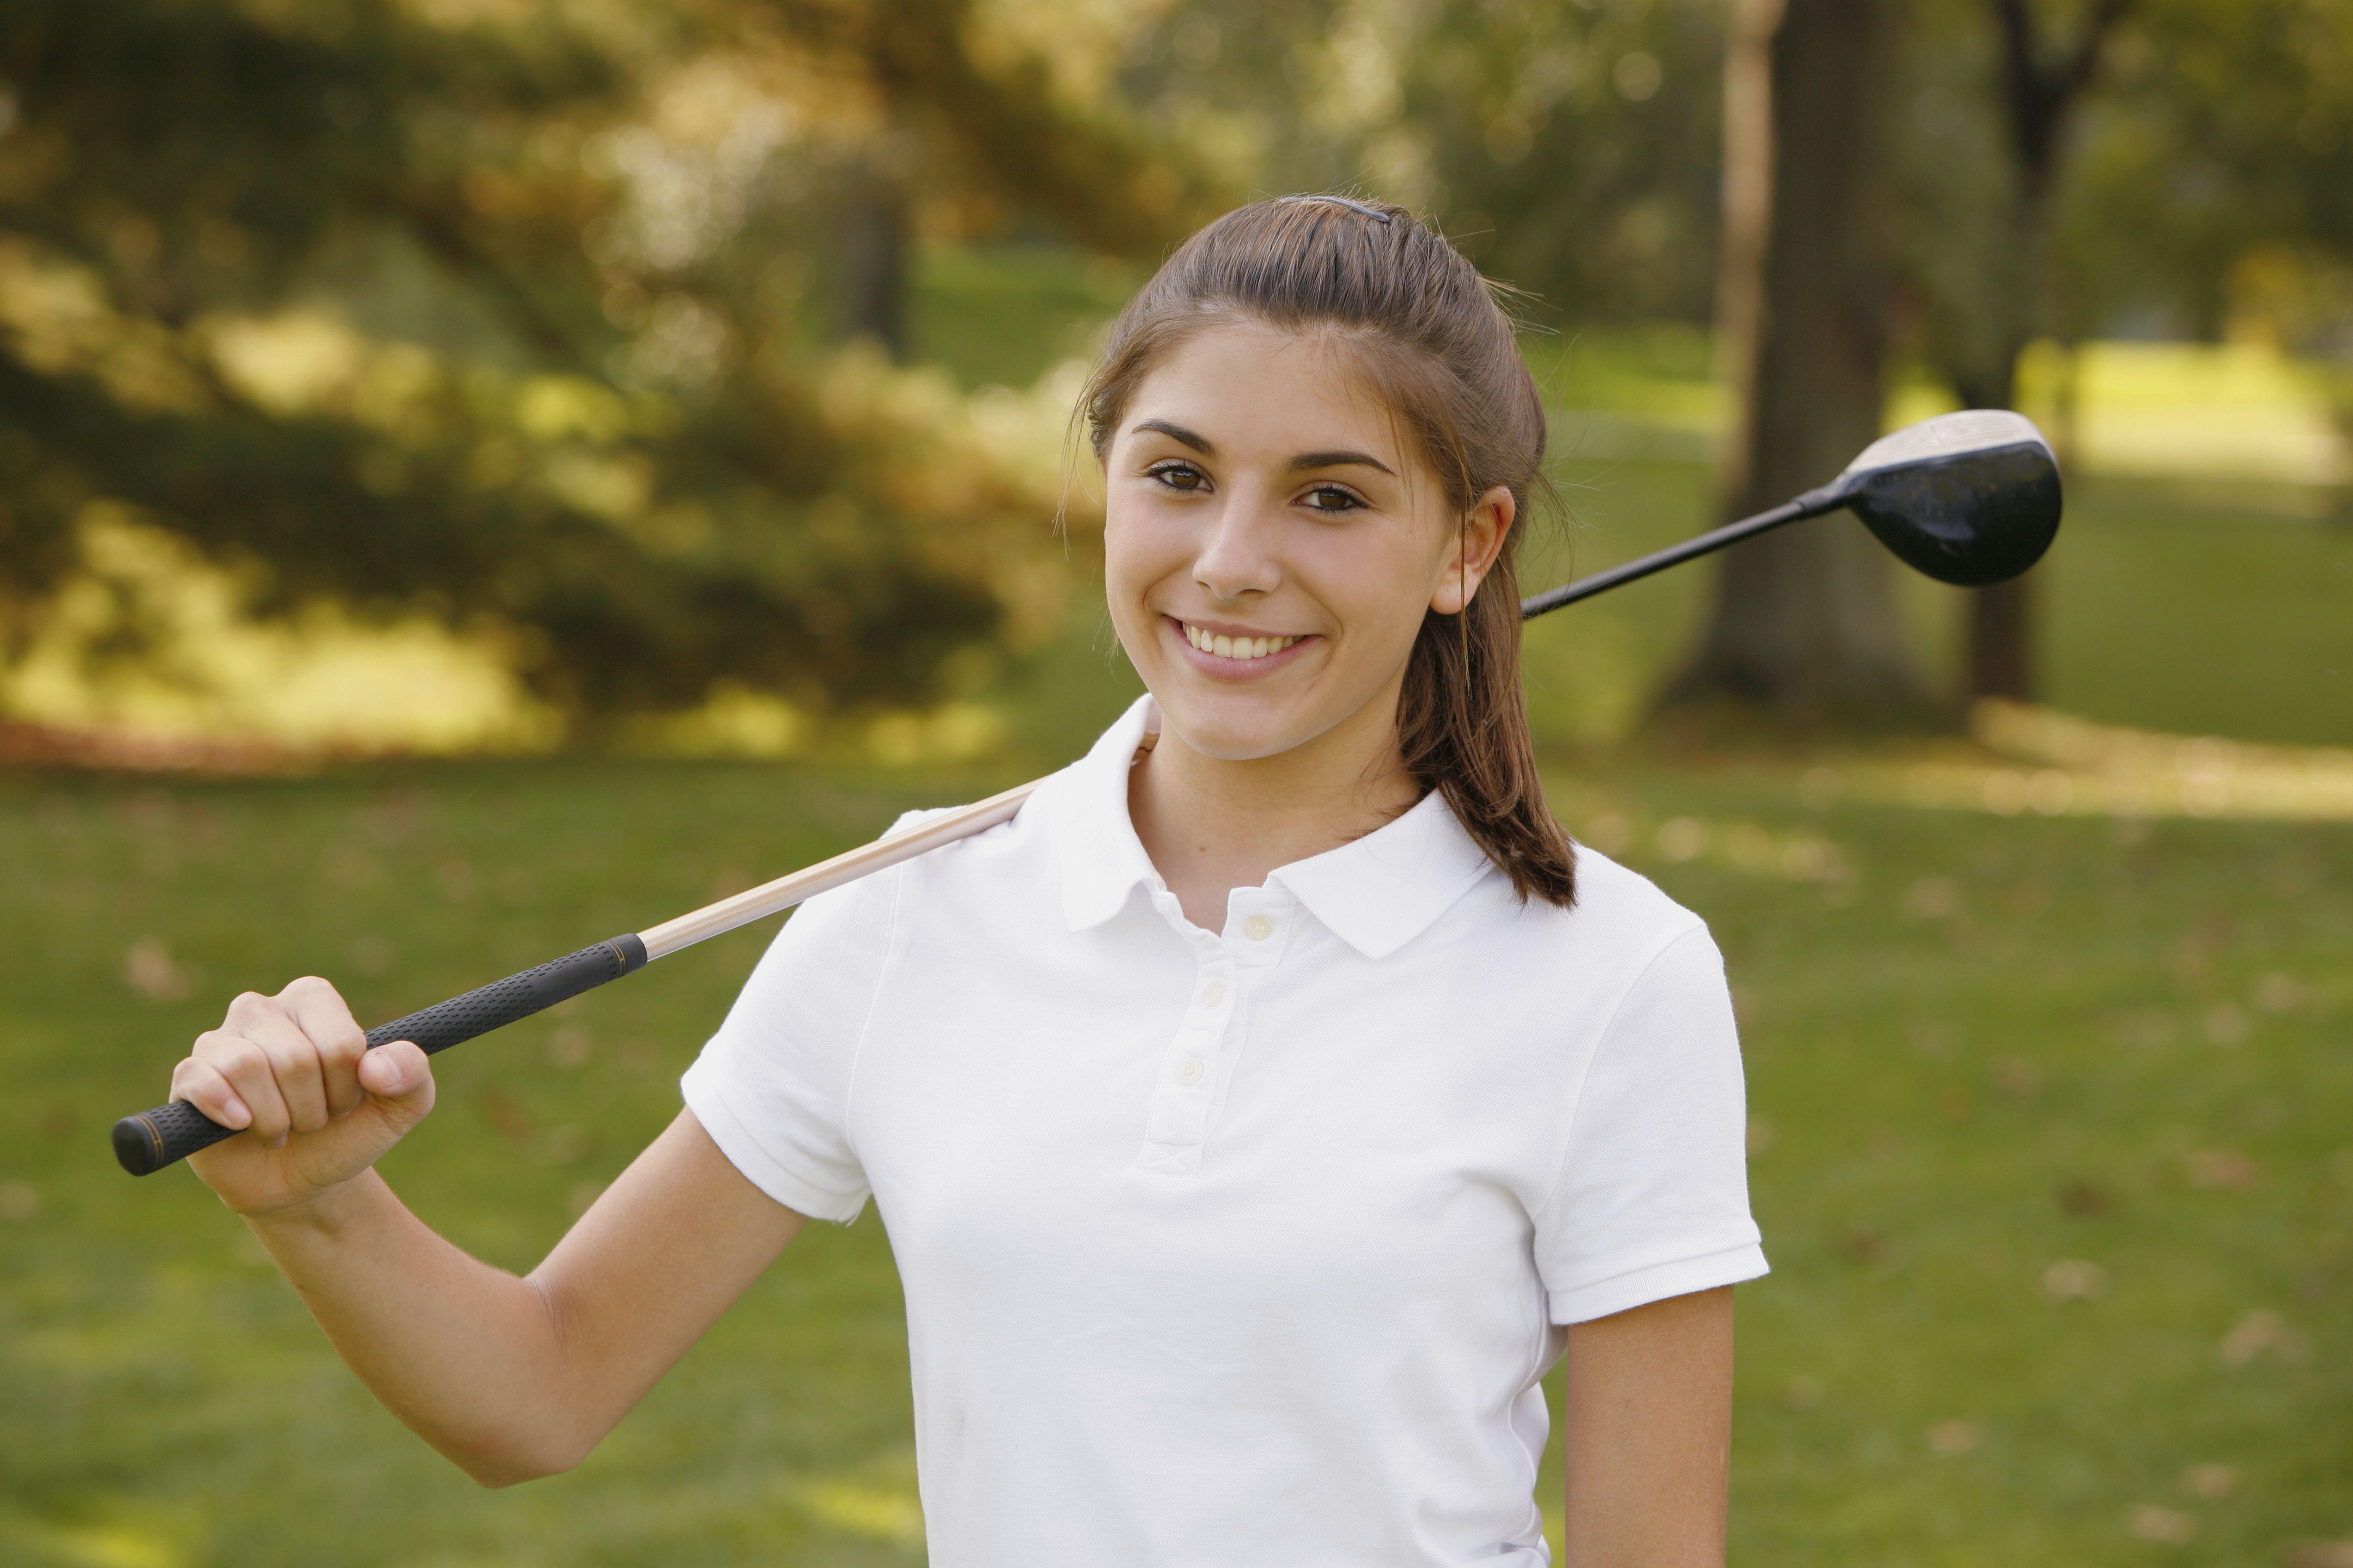 Teenage girl on golf course